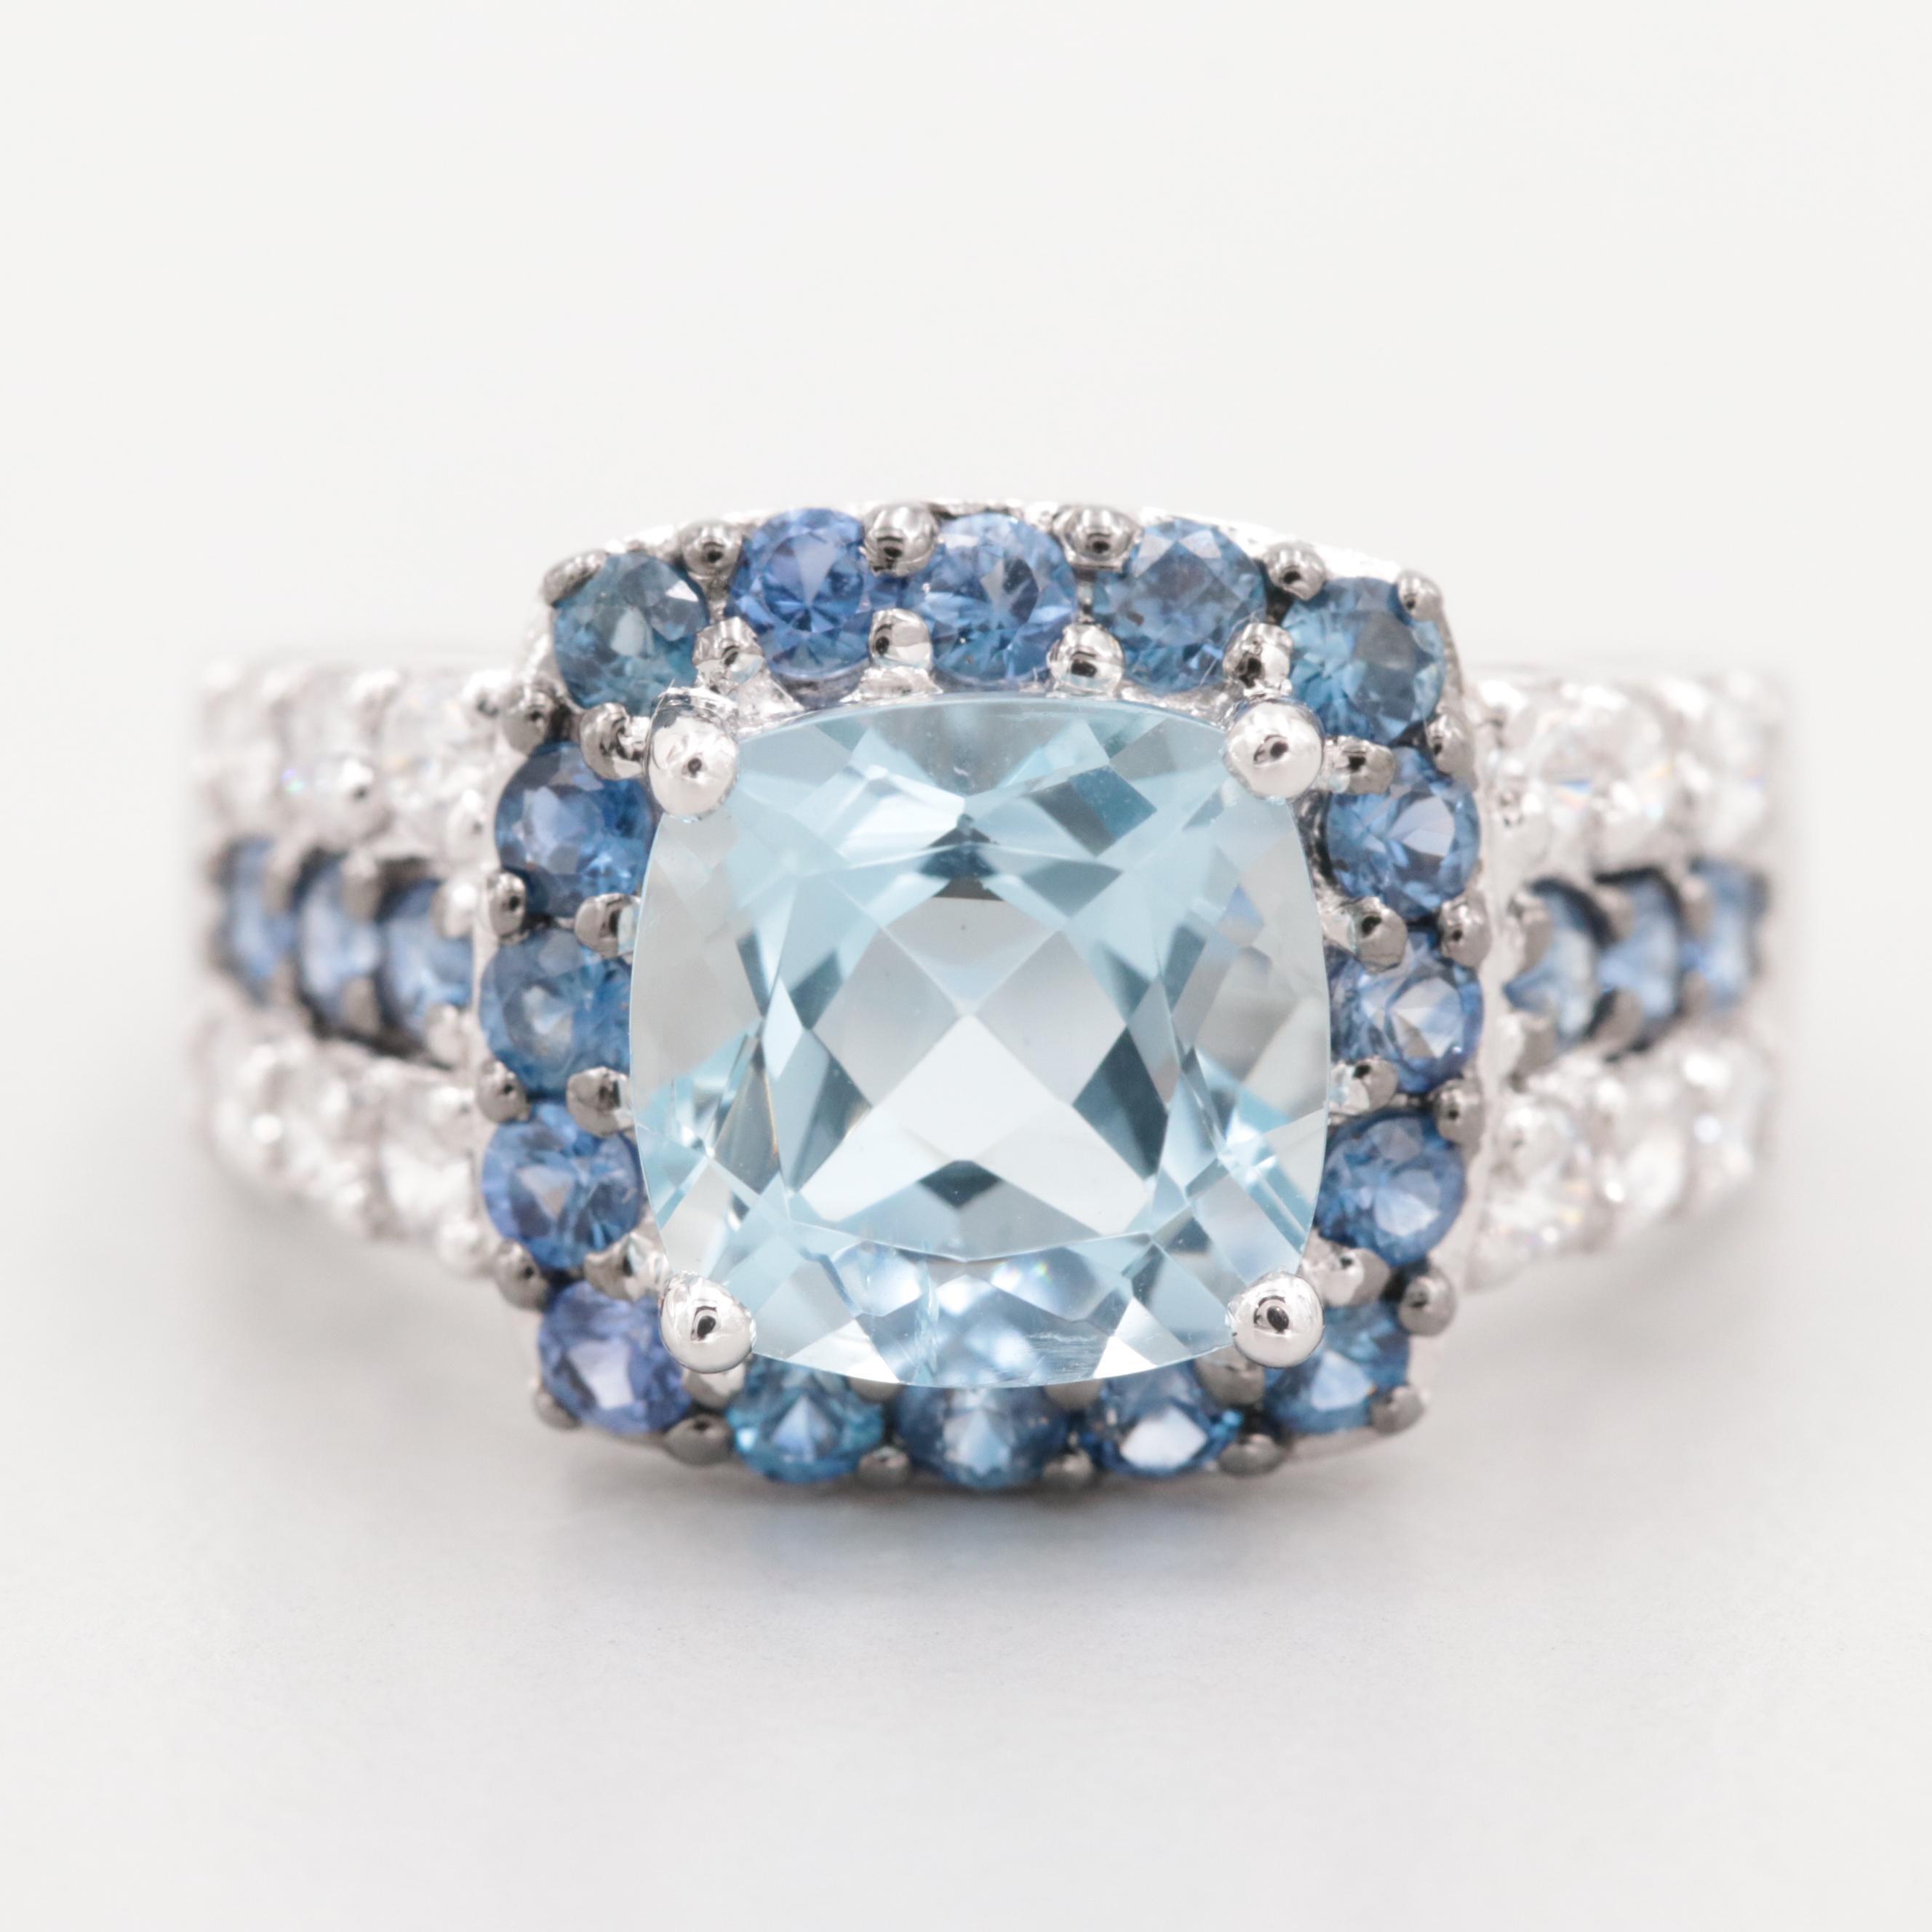 10K White Gold Aquamarine Blue Sapphire and Cubic Zirconia Ring